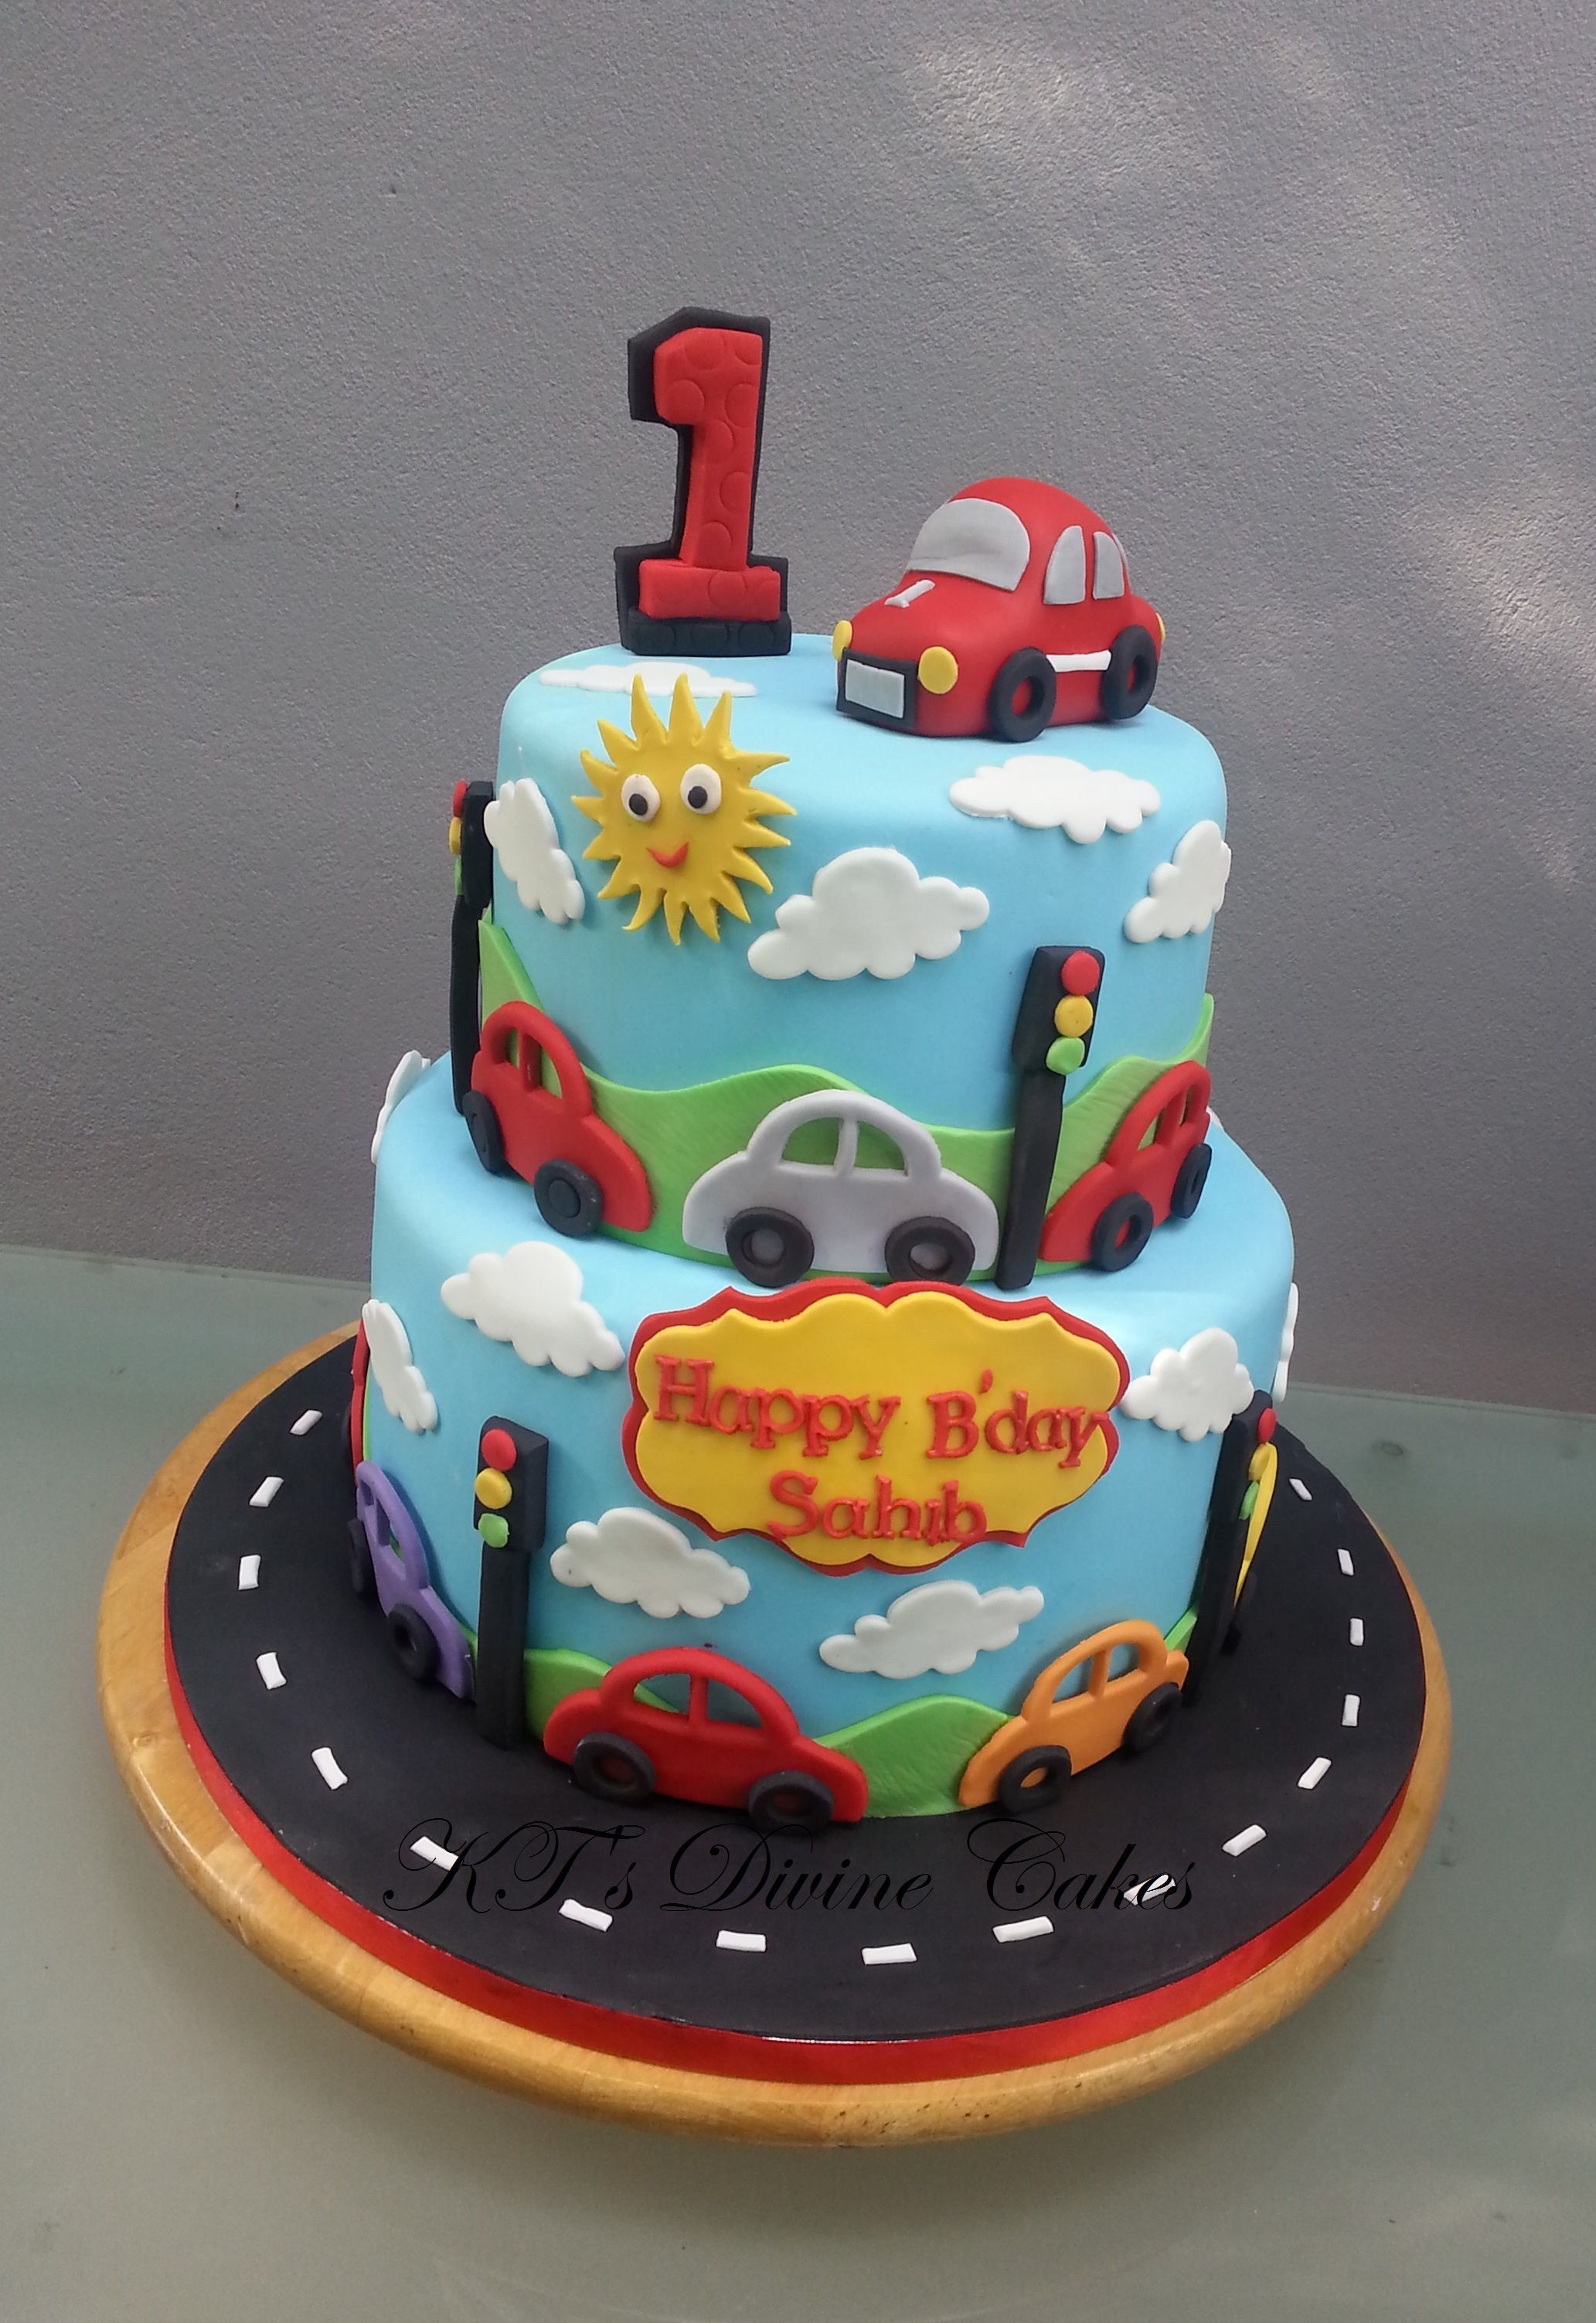 Astonishing 23 Exclusive Image Of Car Birthday Cake Met Afbeeldingen Auto Personalised Birthday Cards Cominlily Jamesorg